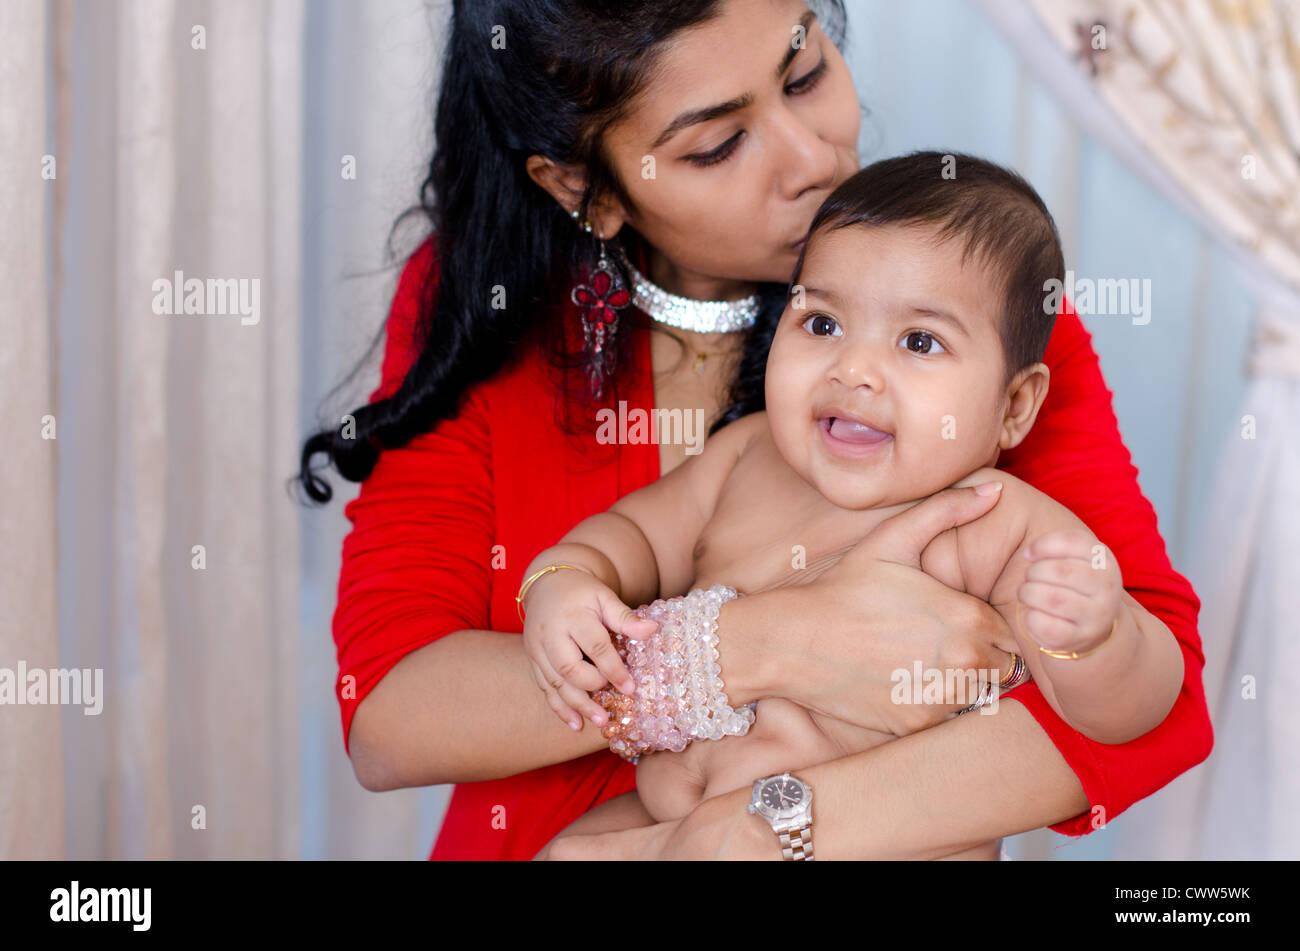 India Stock Photos & Images, India Stock Photography - Alamy